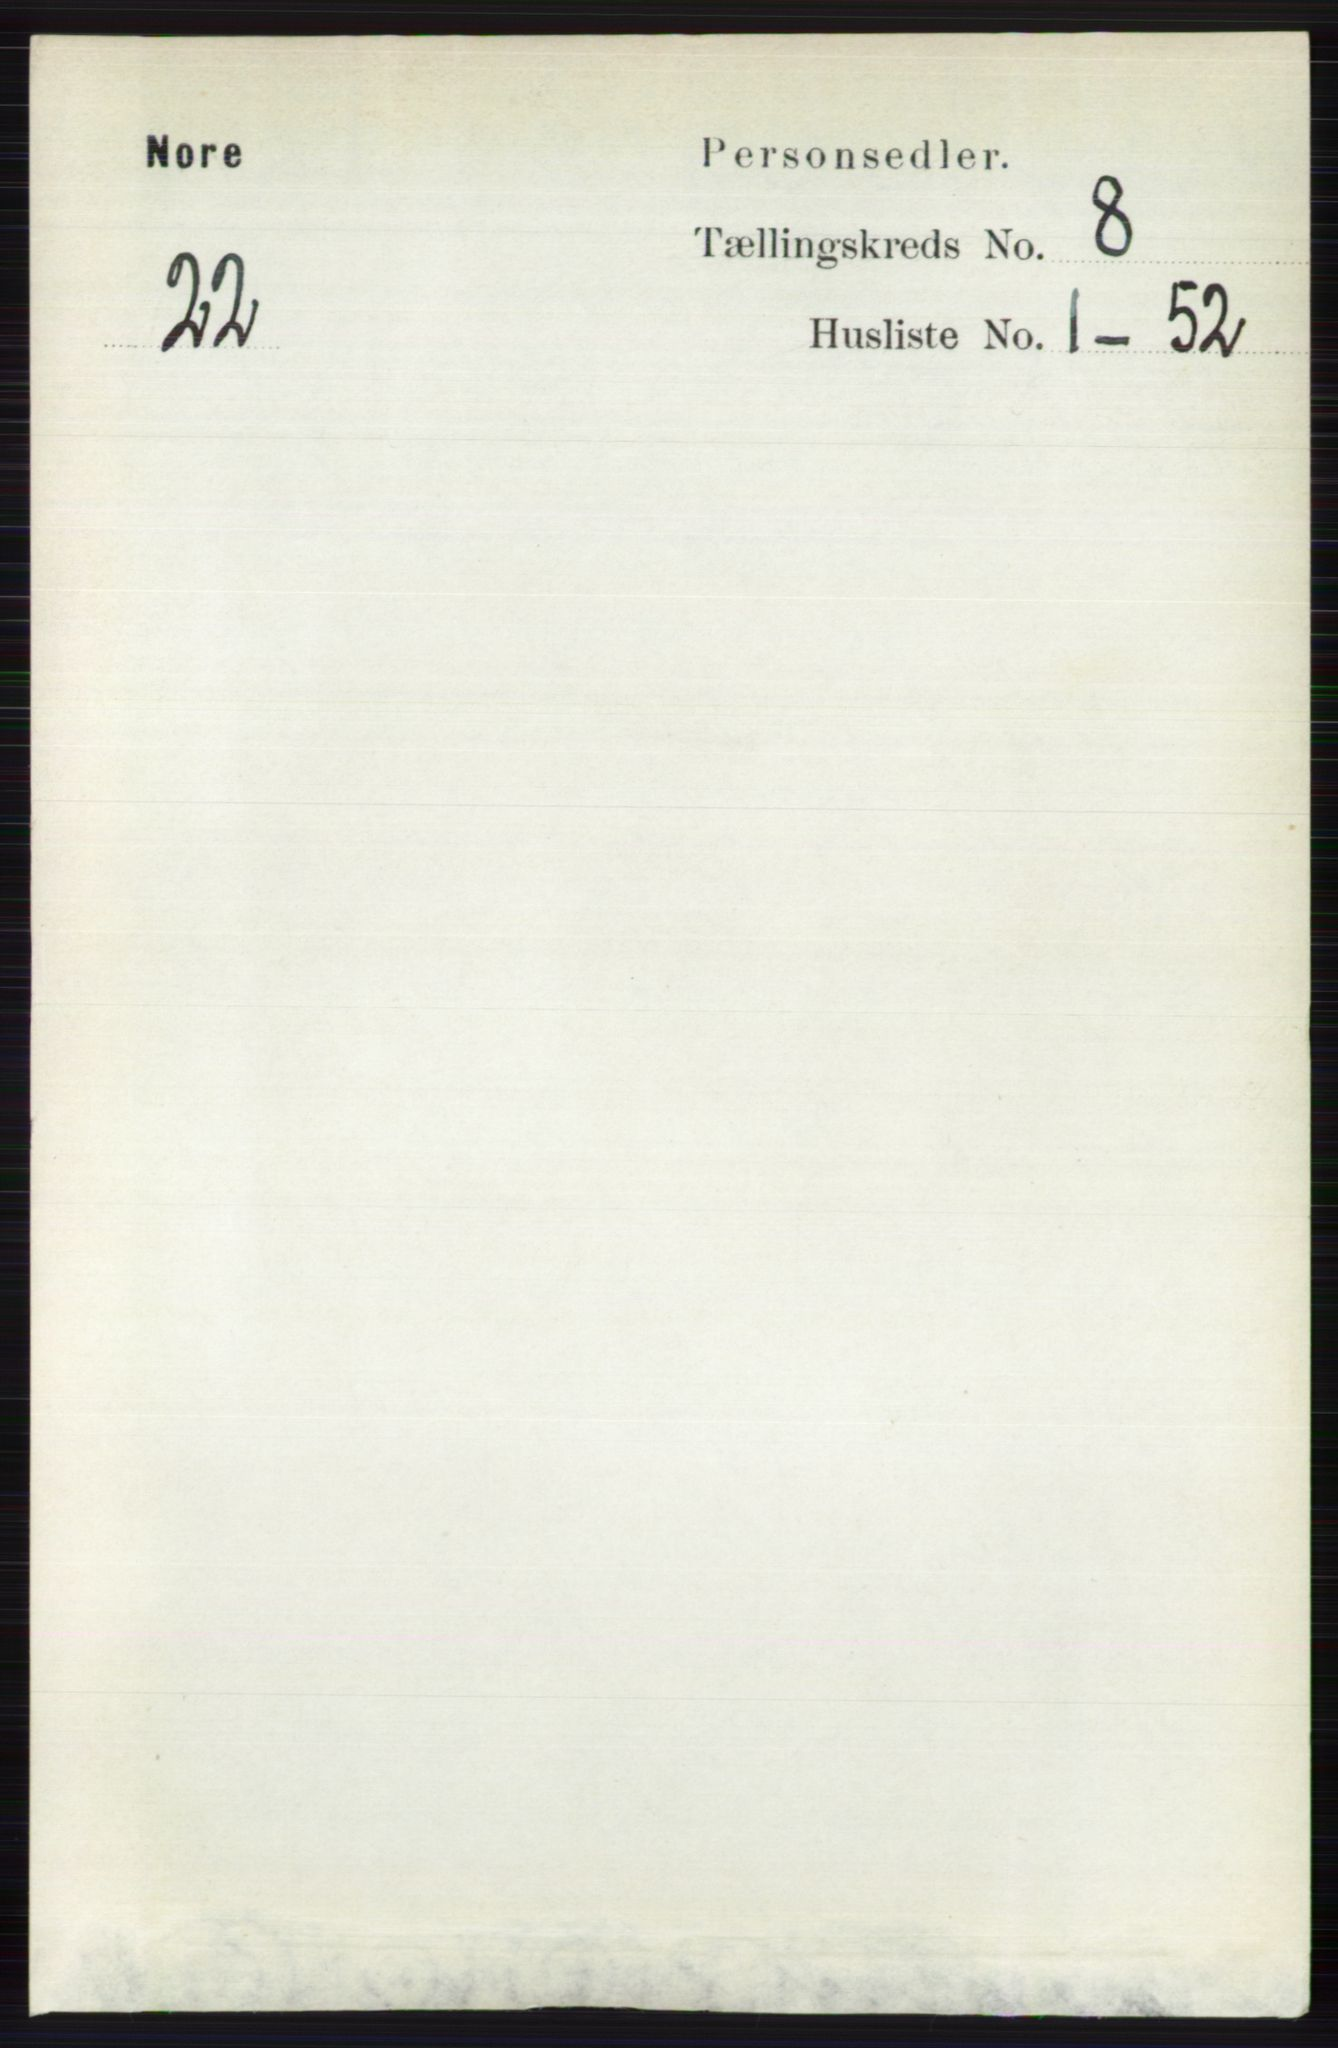 RA, Folketelling 1891 for 0633 Nore herred, 1891, s. 2844